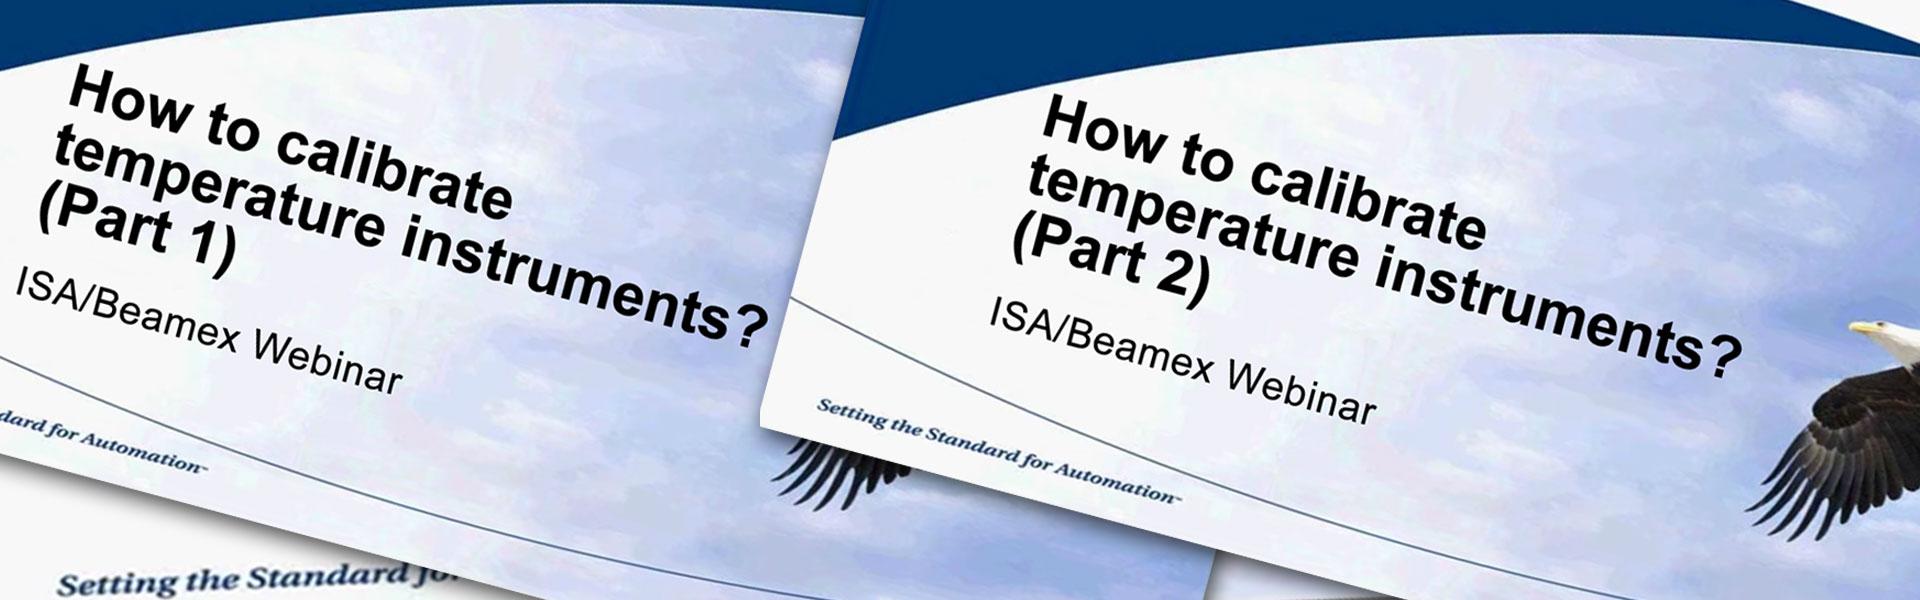 How to calibrate temperature instruments [Webinar]